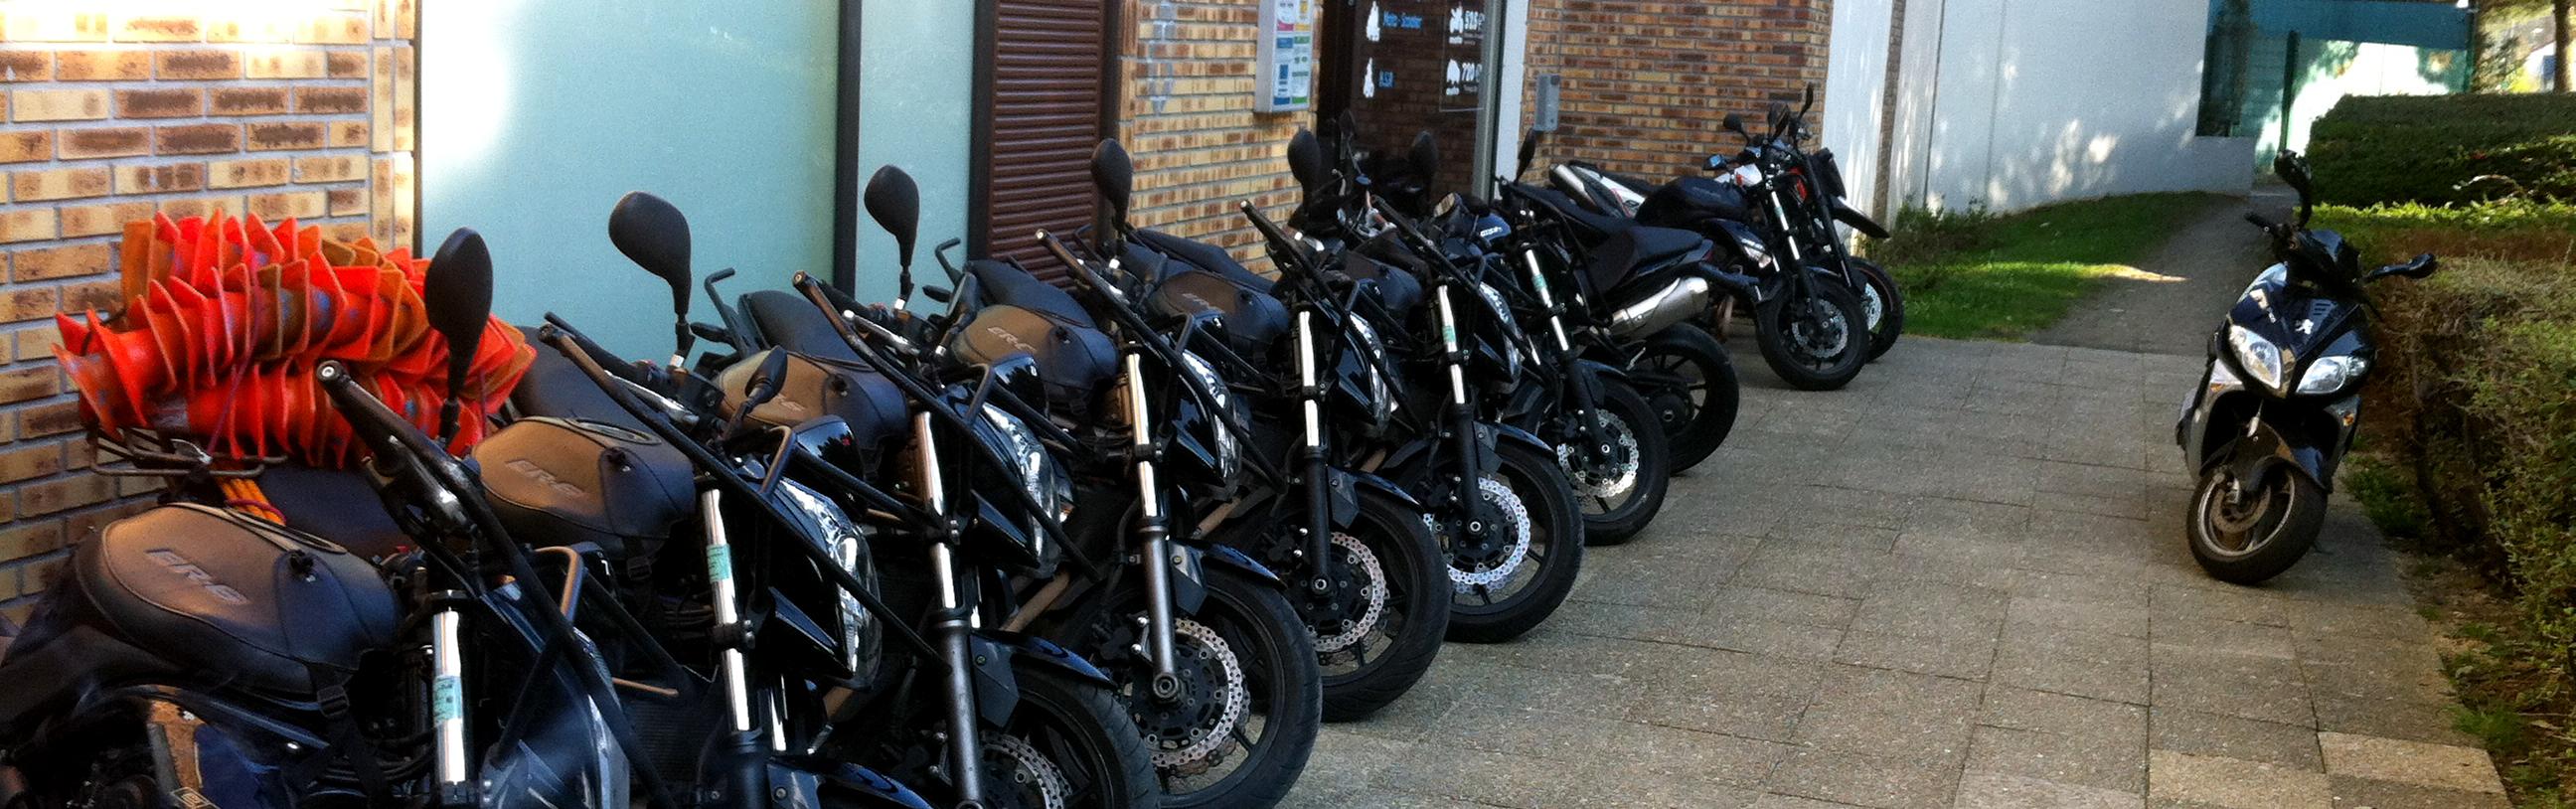 sucy conduites permis maxi scooter moto 589. Black Bedroom Furniture Sets. Home Design Ideas